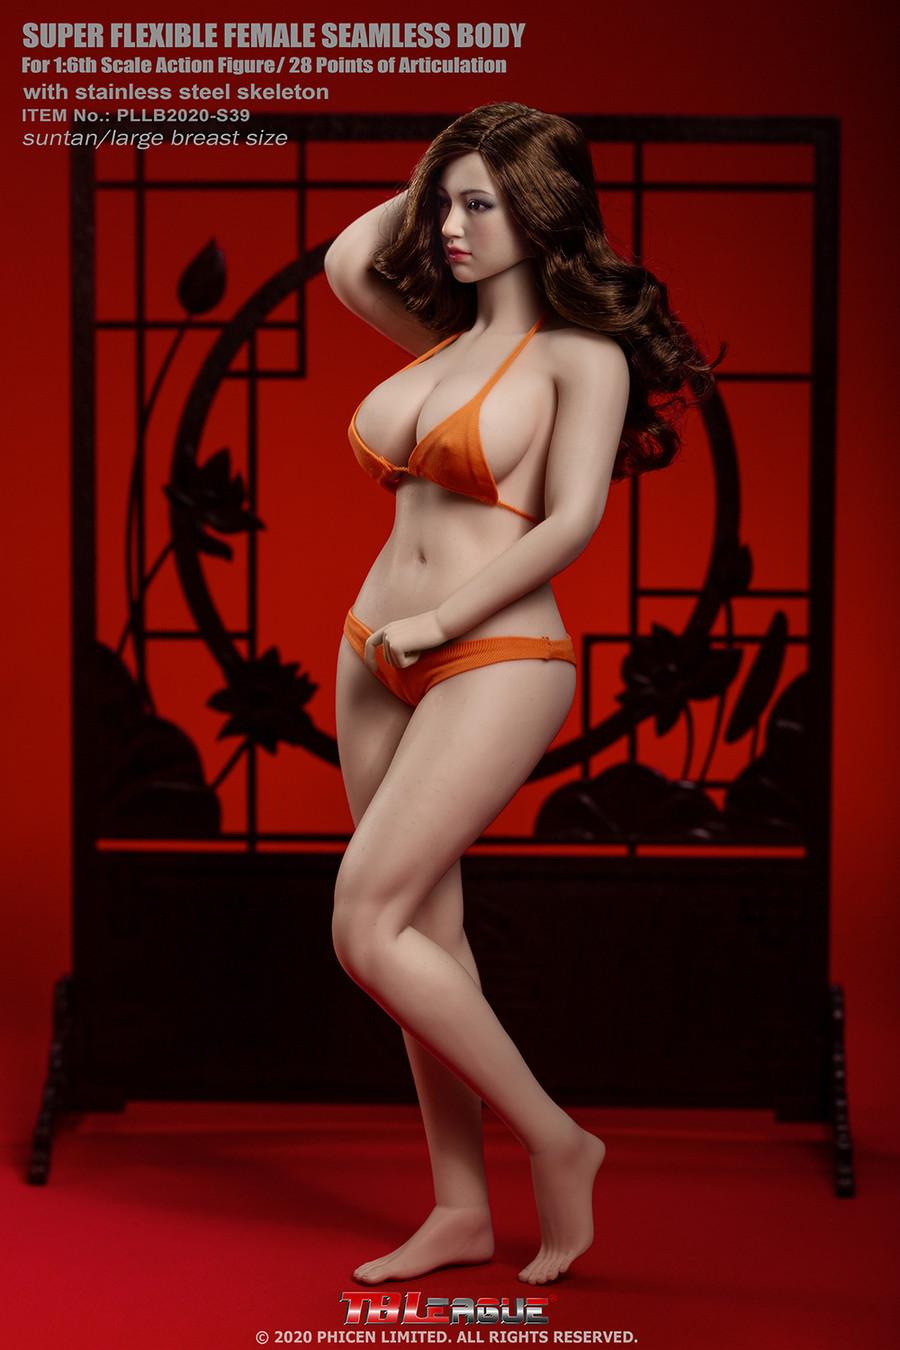 TBLeague - Female Super-Flexible Seamless Body with Head - Large Bust Body in Suntan S39